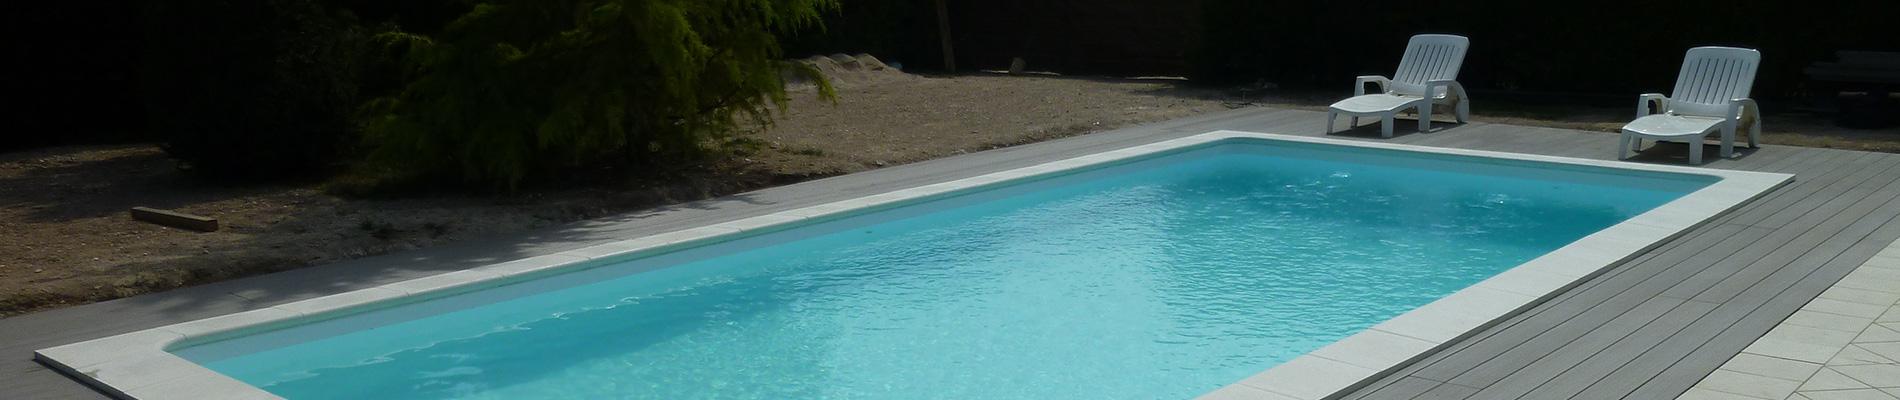 NANO, the small pool